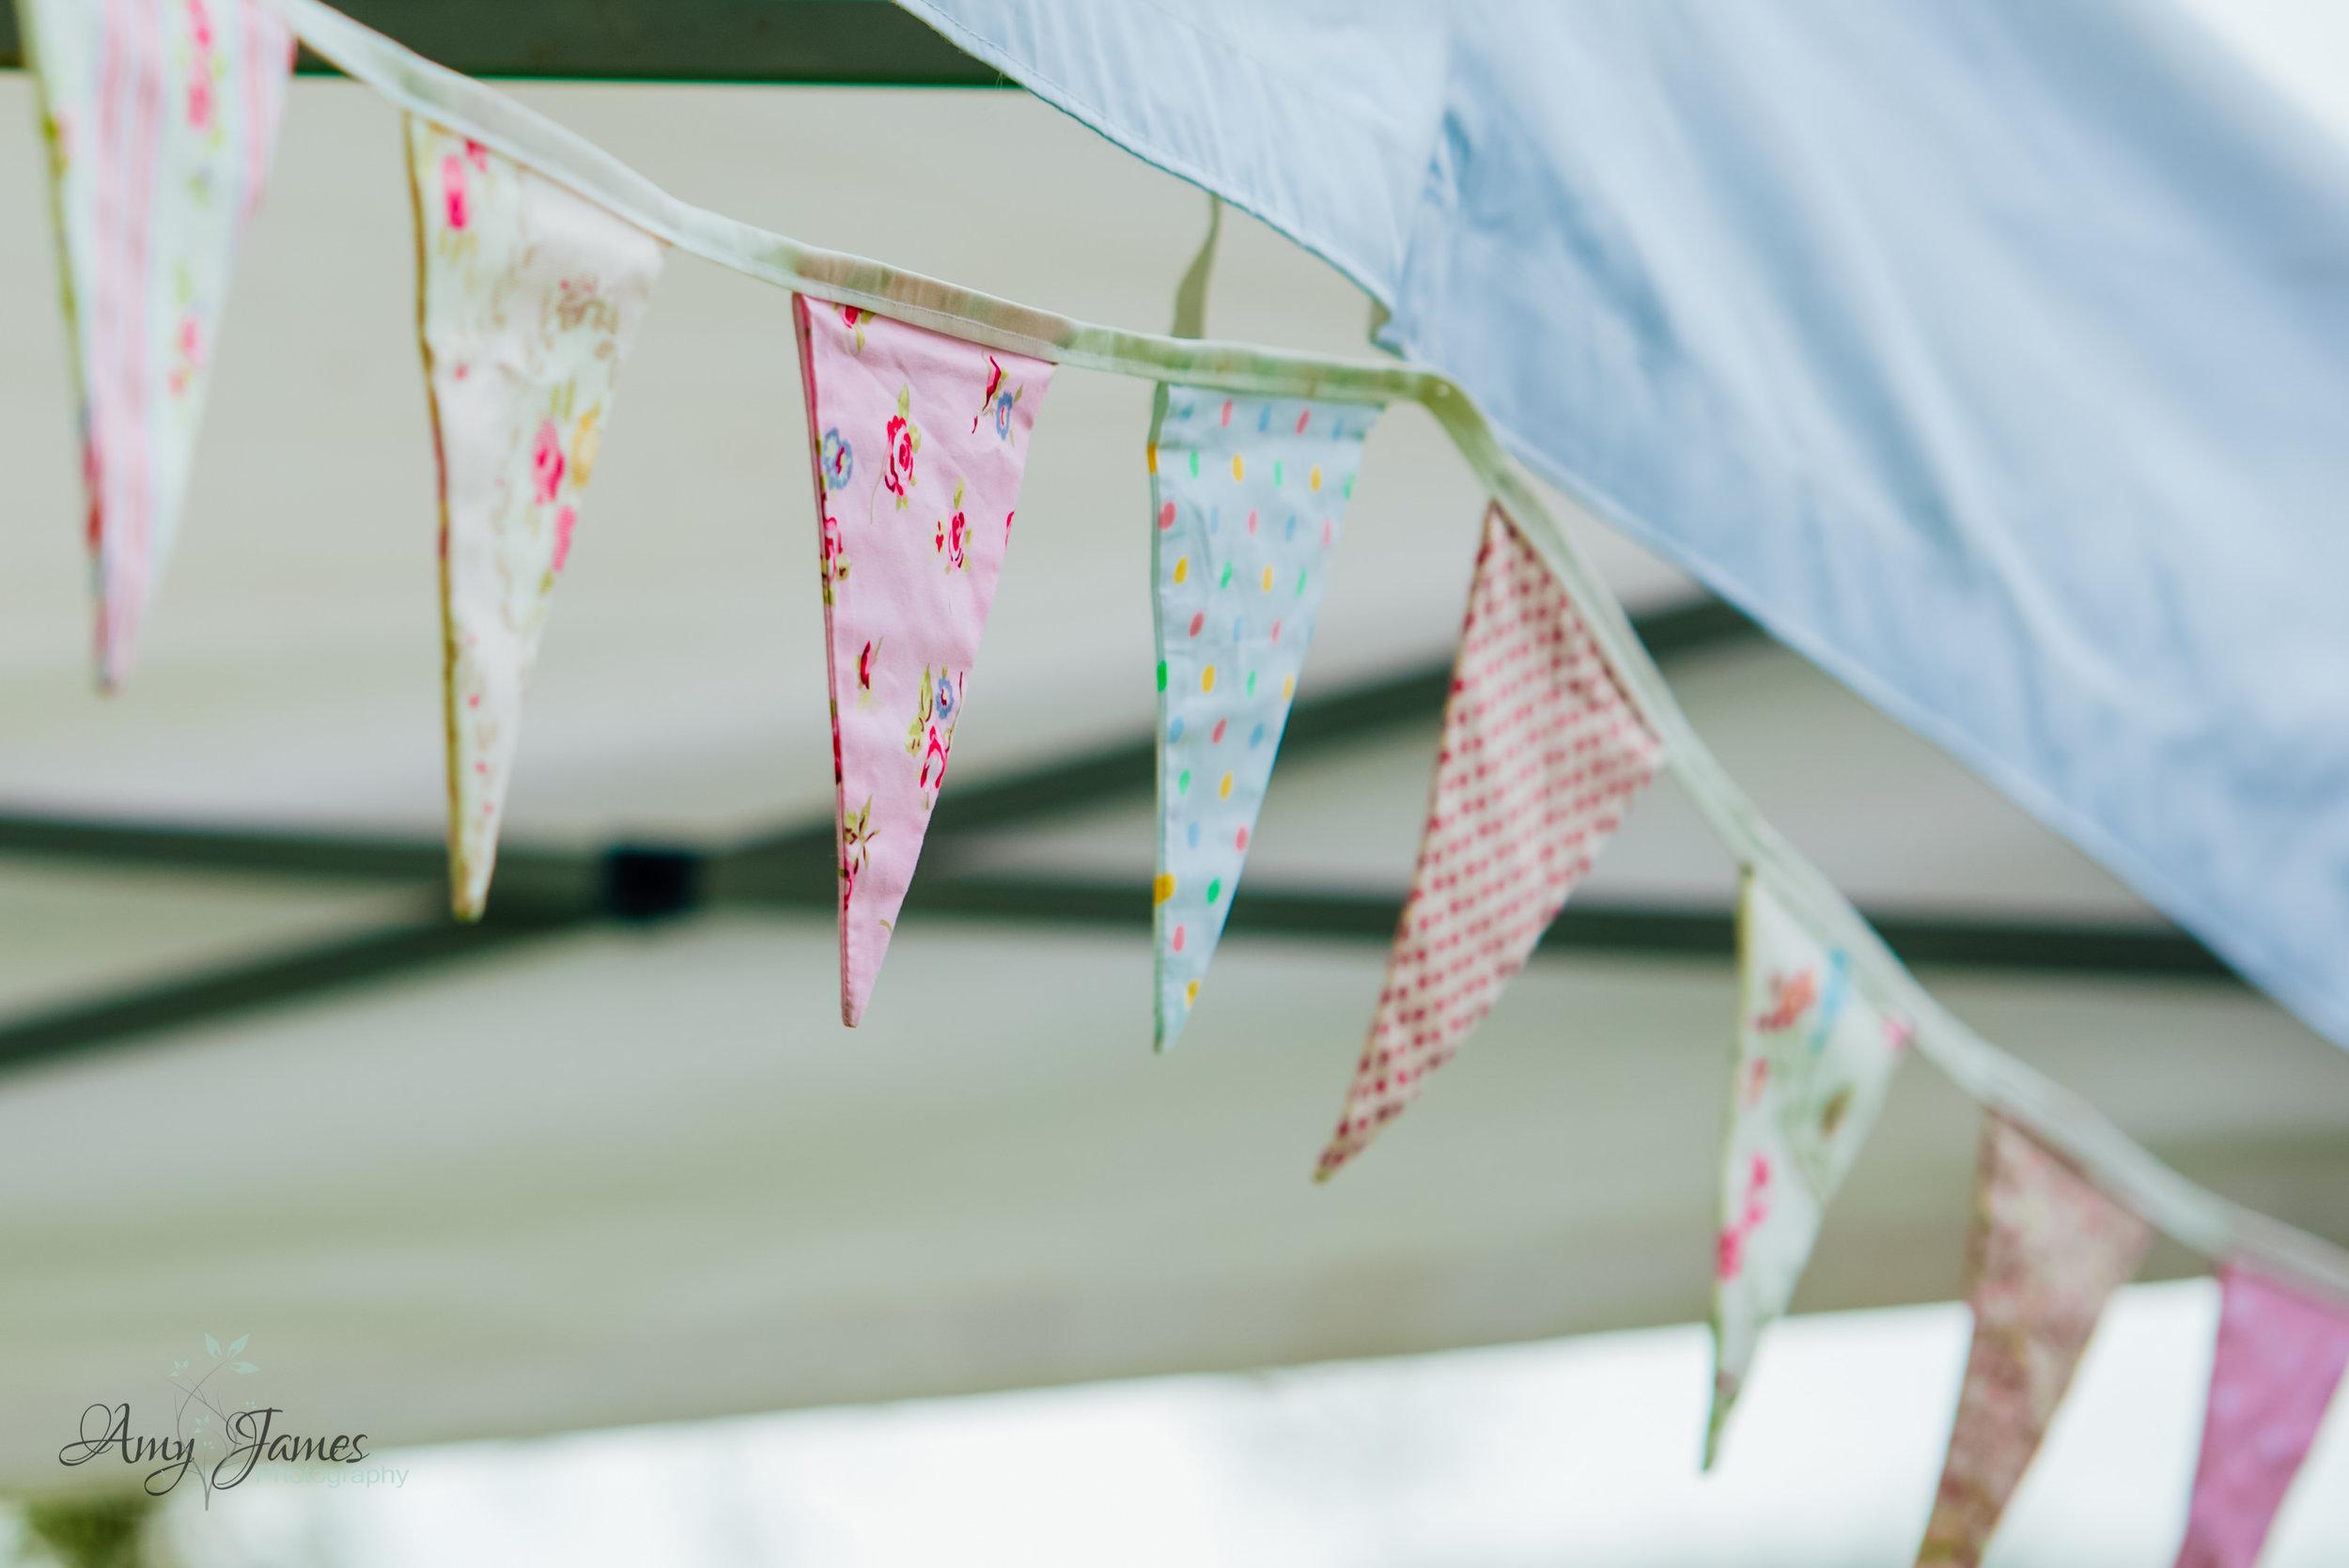 Wedding bunting - outdoor wedding ceremony - Amy James Photography